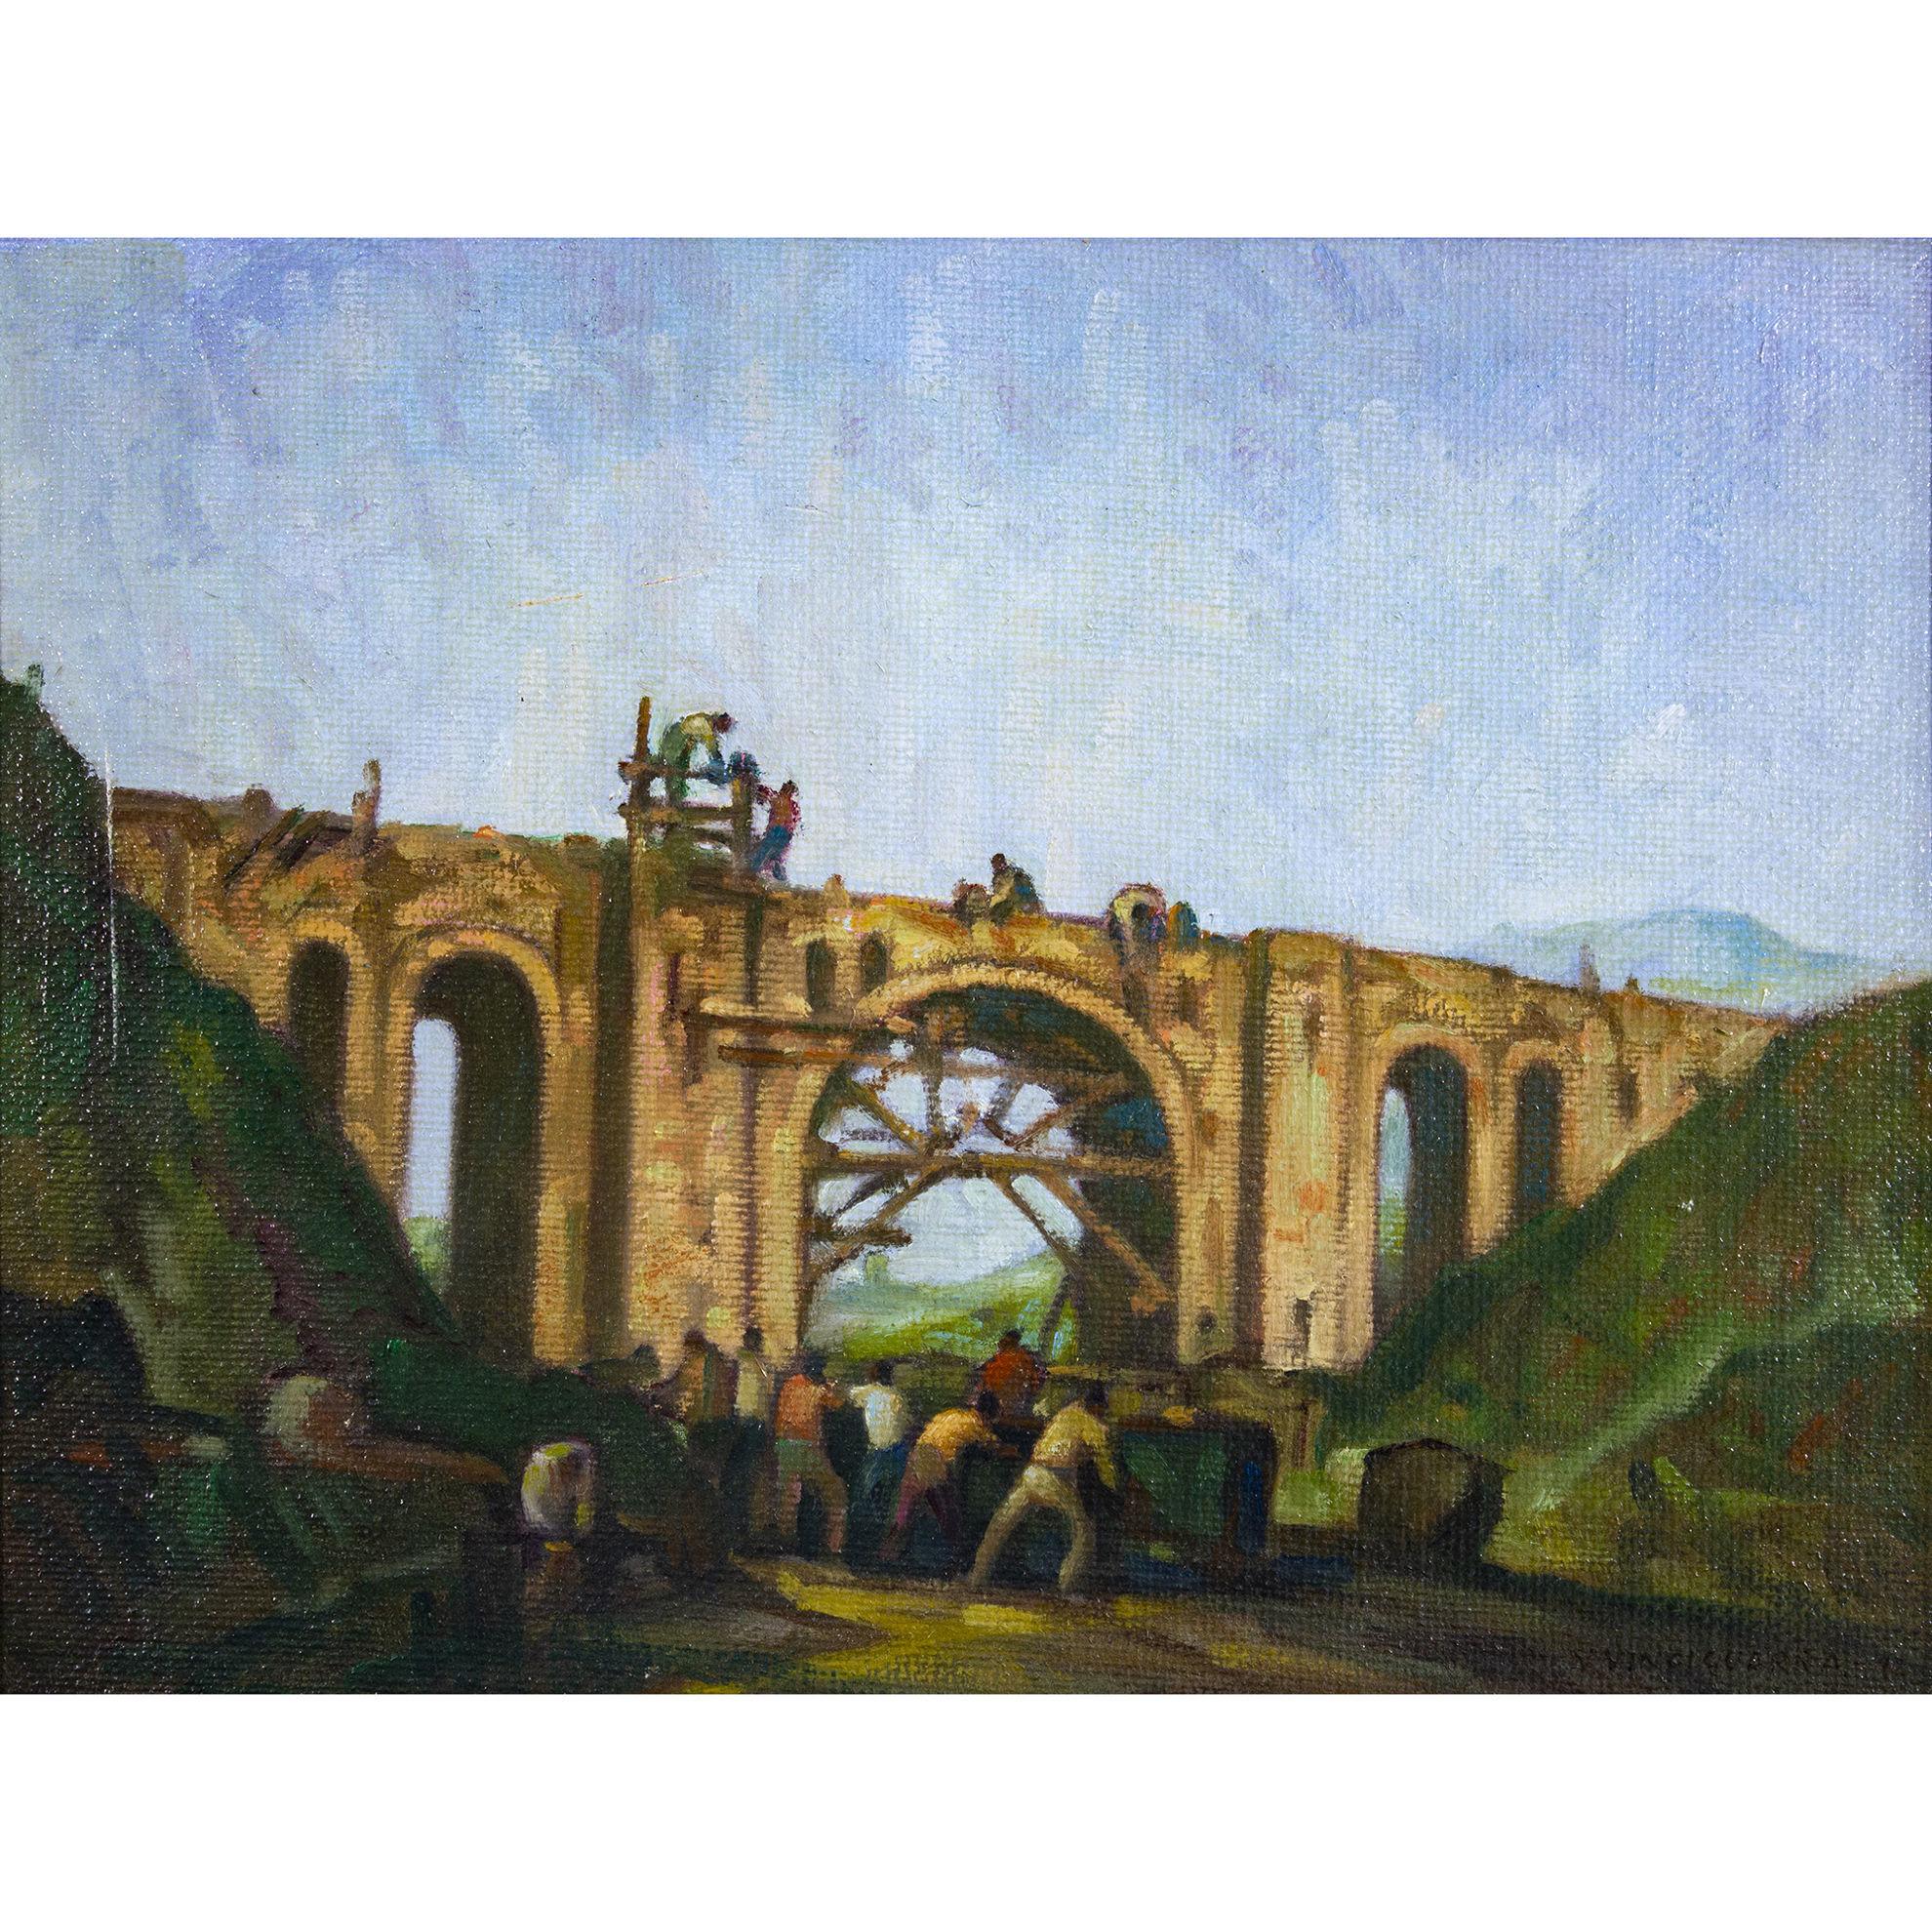 Immagine di Ponte in costruzione